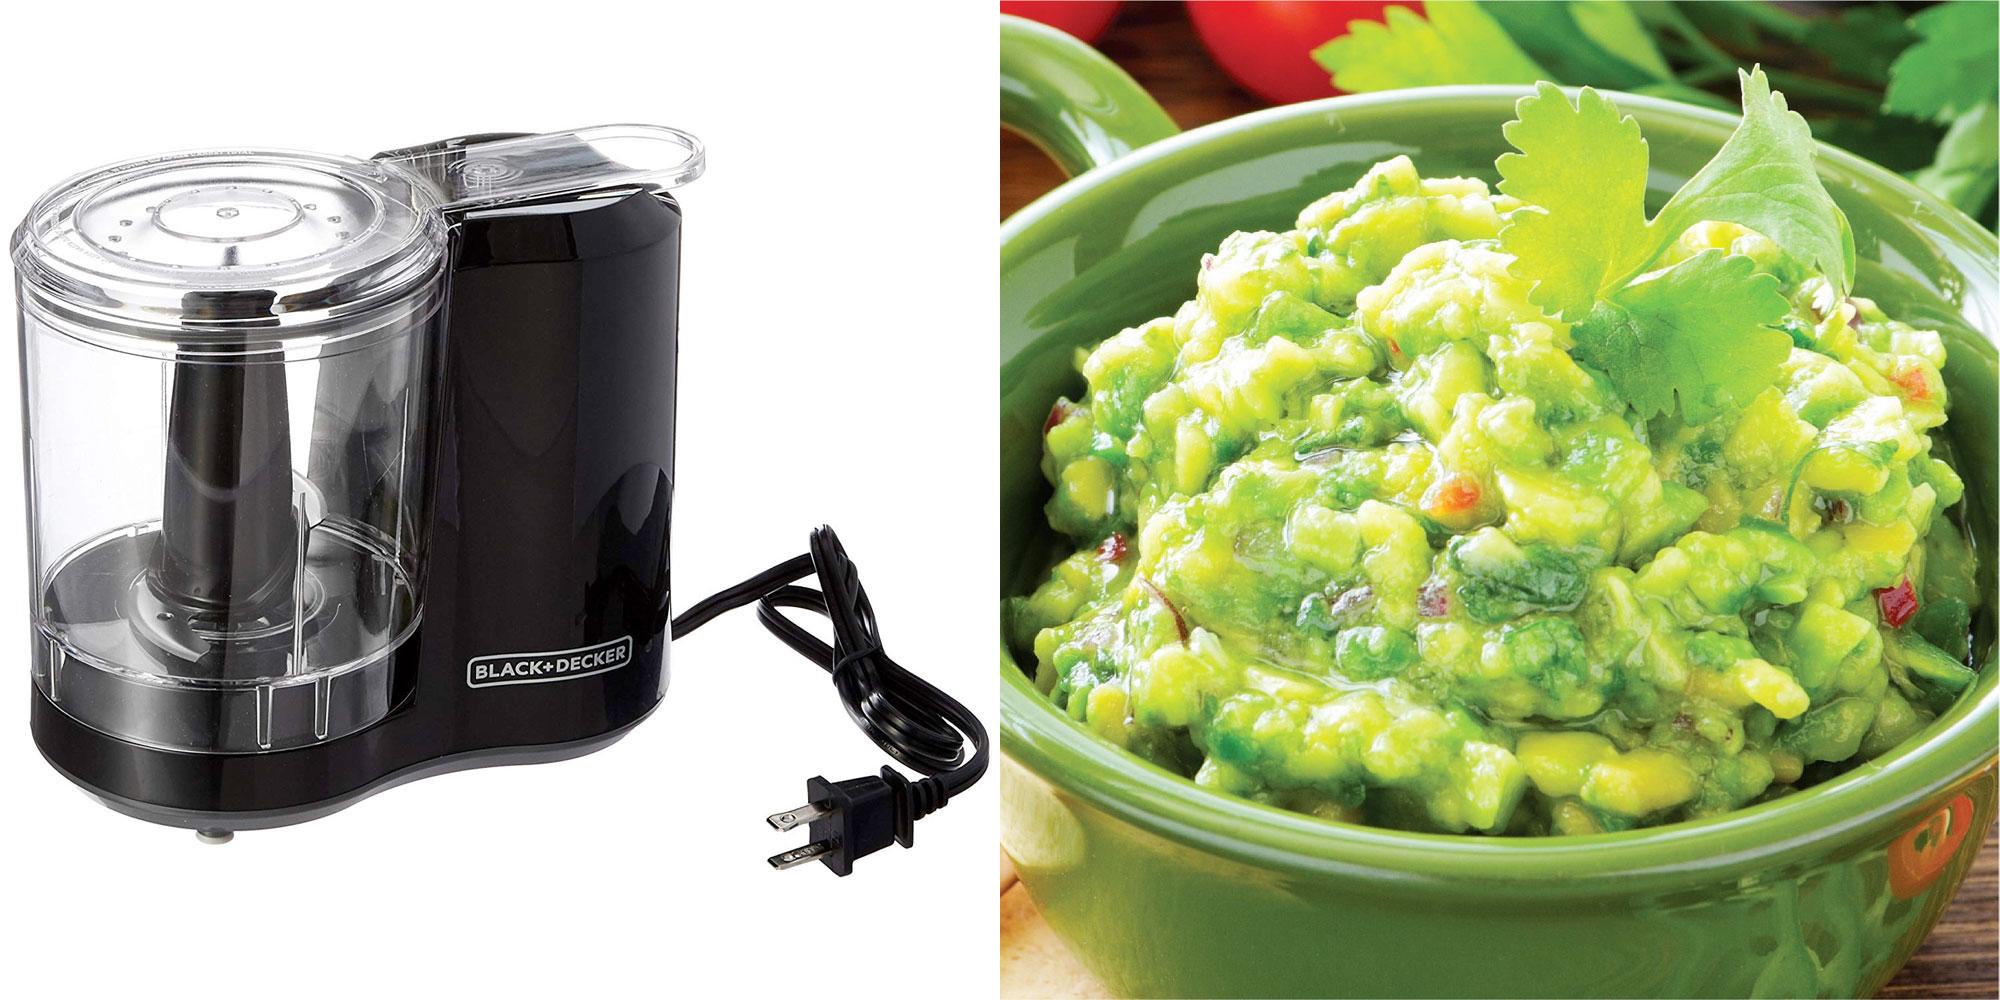 BLACK+DECKER's powerful 175W electric food chopper belongs in every kitchen for $14